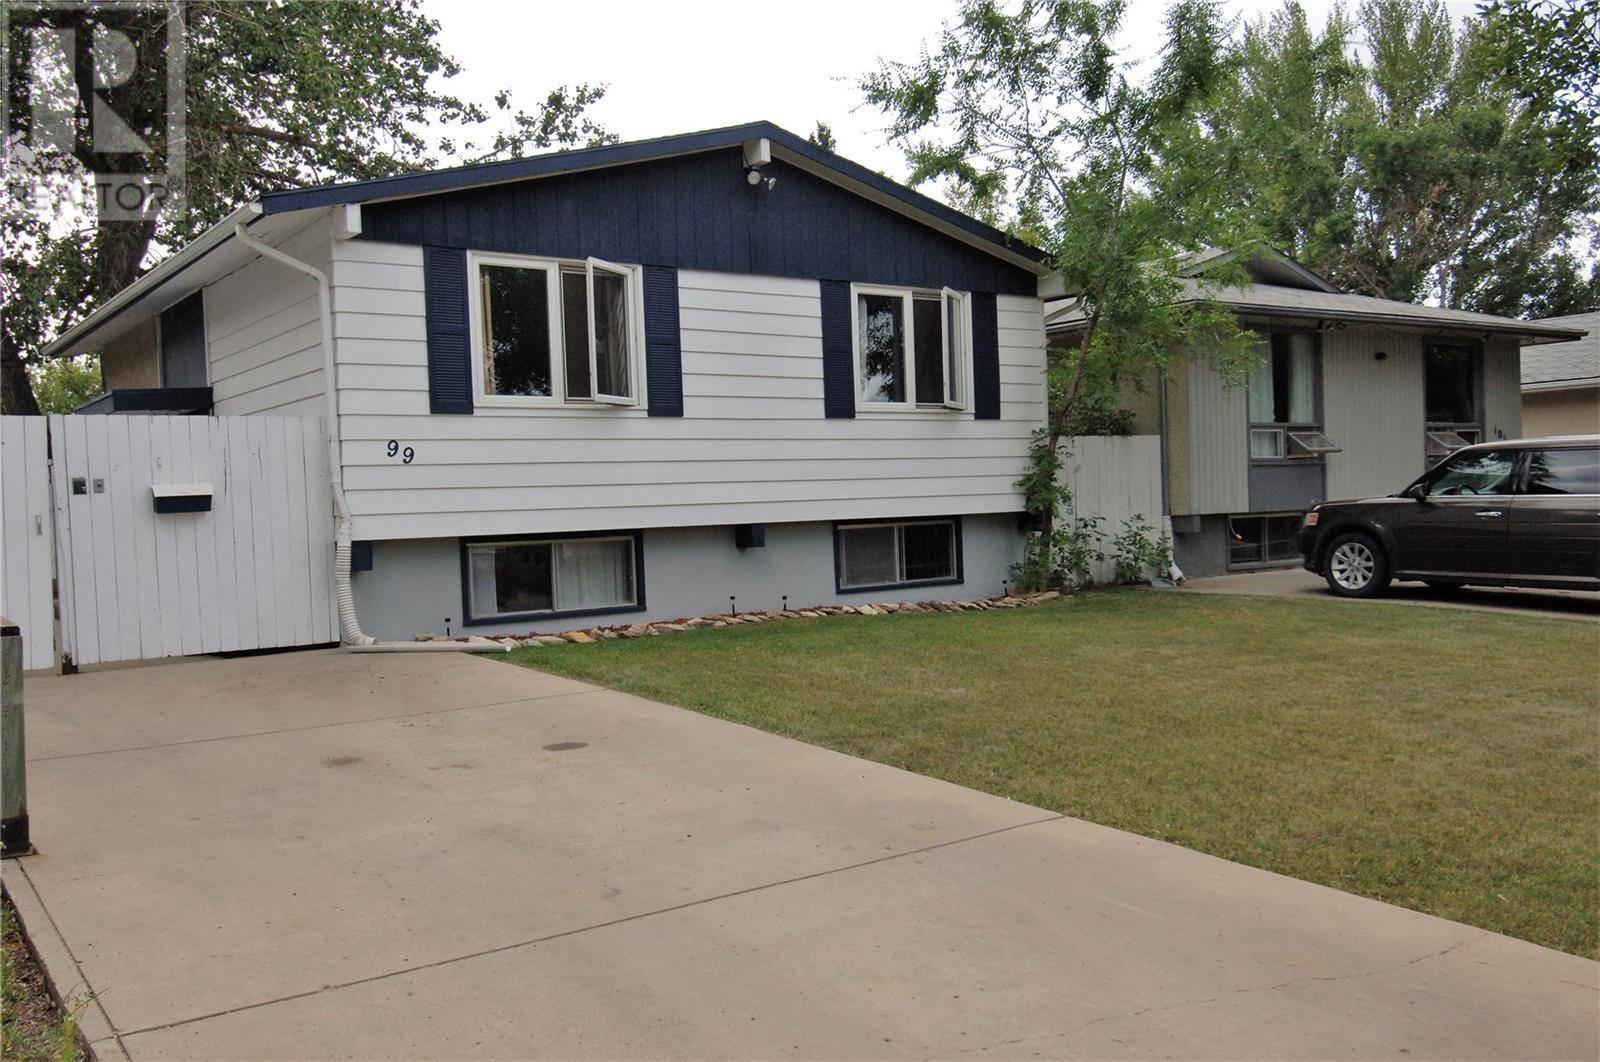 House for sale at 99 Ross Cres Saskatoon Saskatchewan - MLS: SK783920